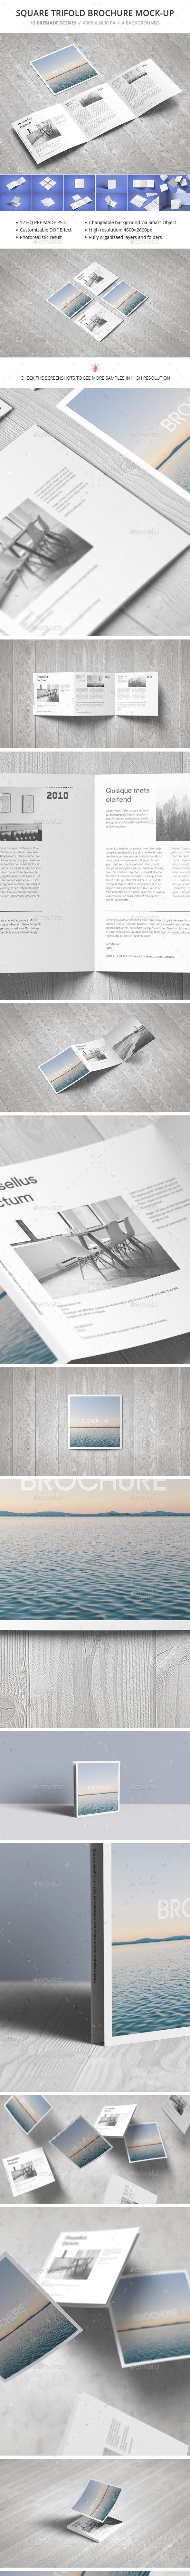 Square Trifold Brochure Mock-up - Brochures Print